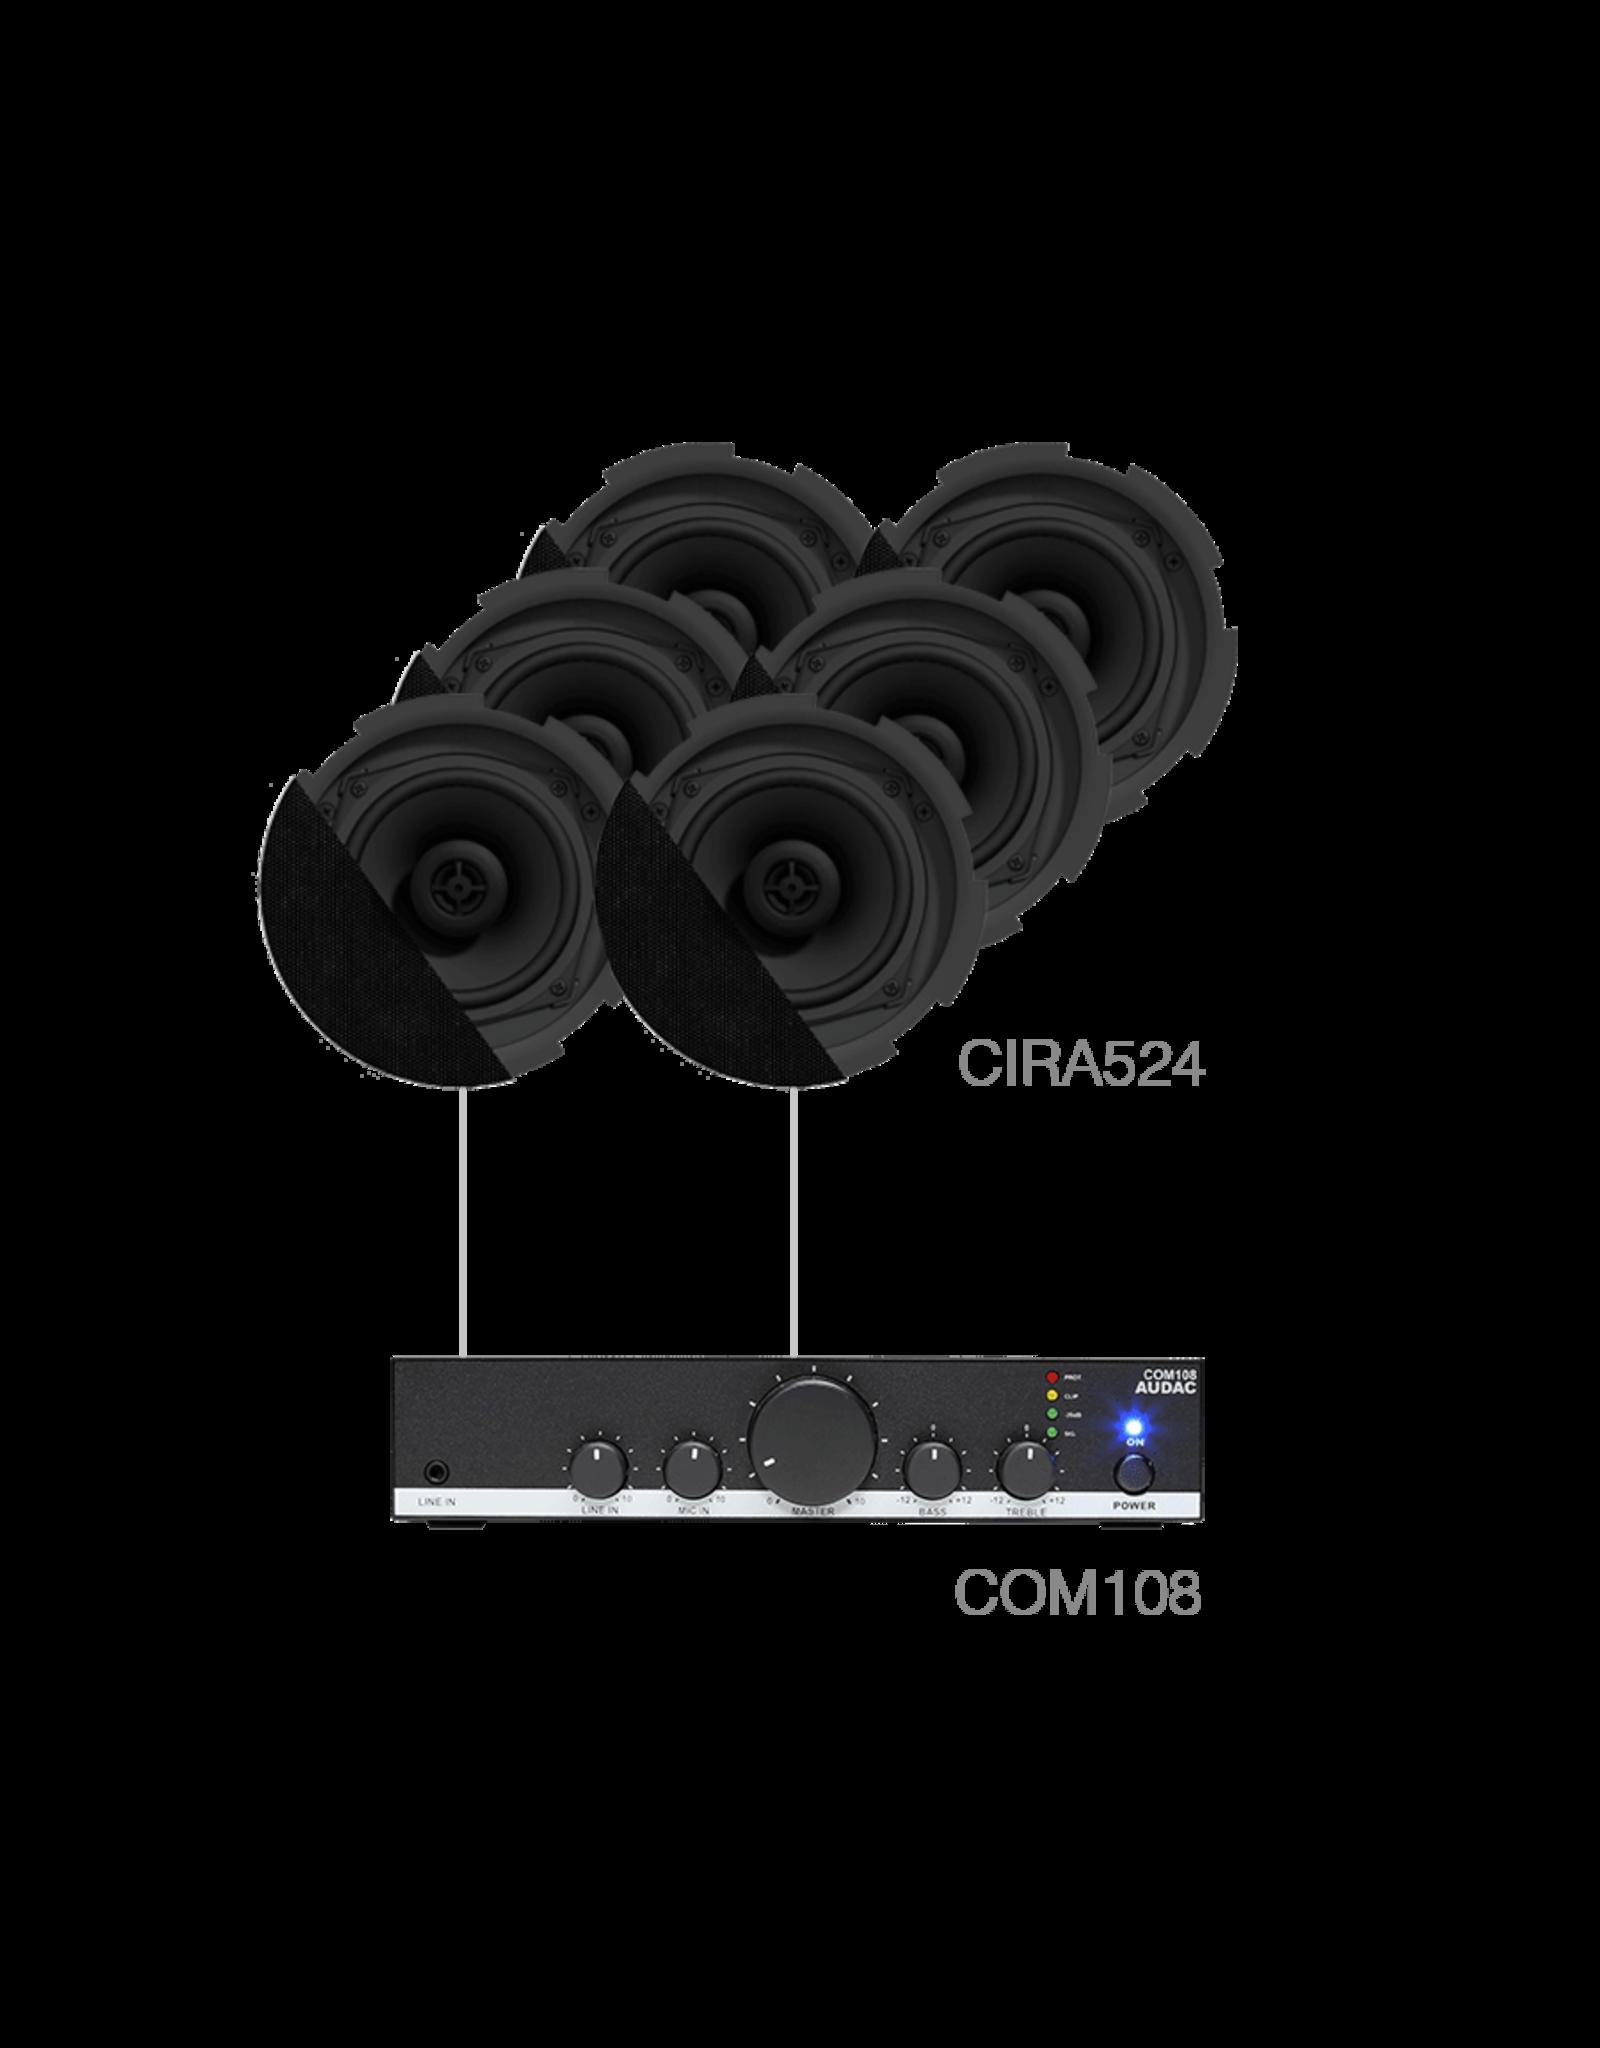 Audac 6 x CIRA524 + COM108 Black version